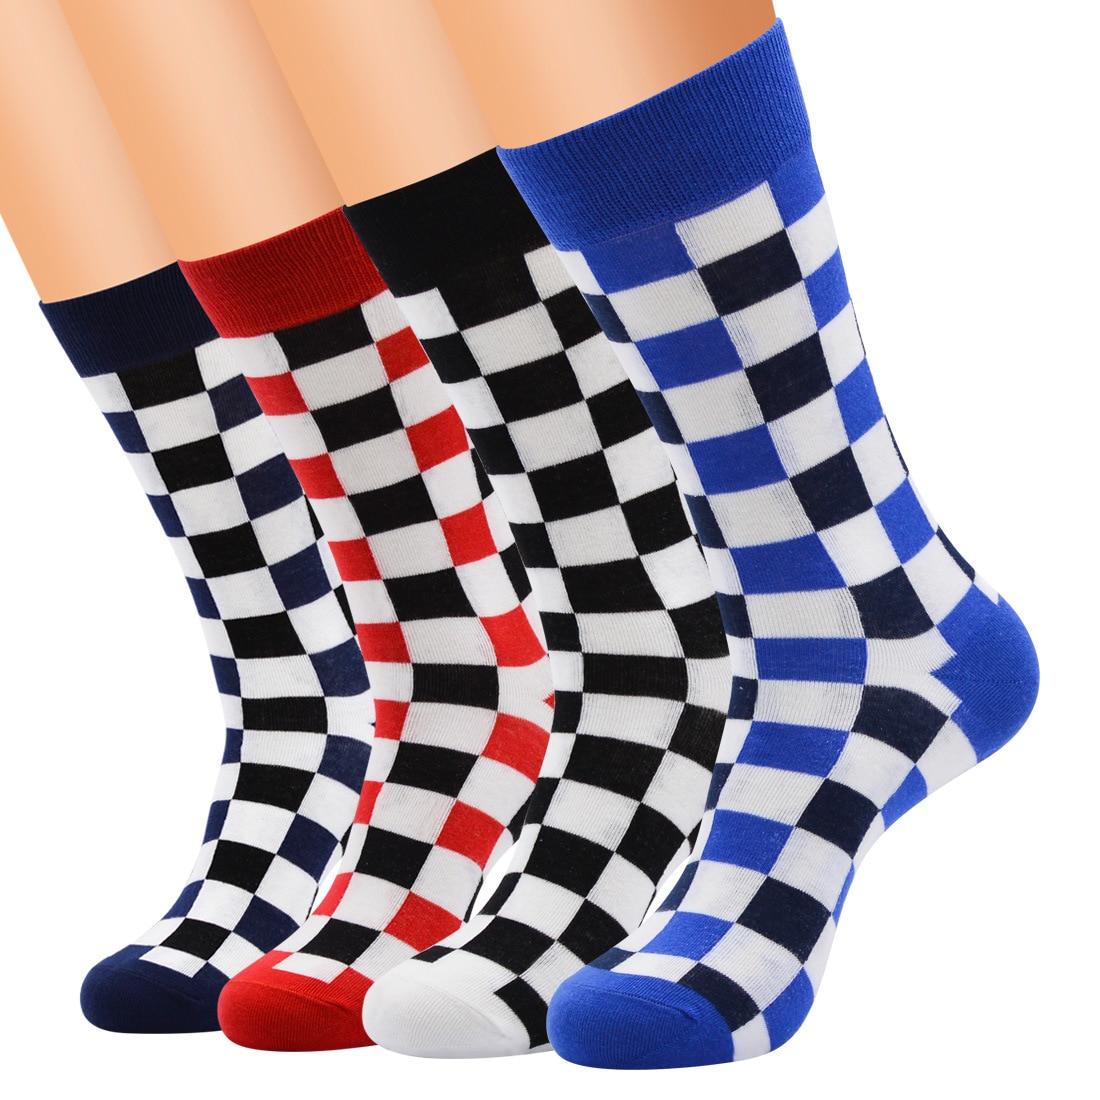 12 Pairs Korea Fashion Harajuku Trends Male Checkerboard Socks Style Geometric Checkered Socks Men Hip Hop Cotton Unisex Soks